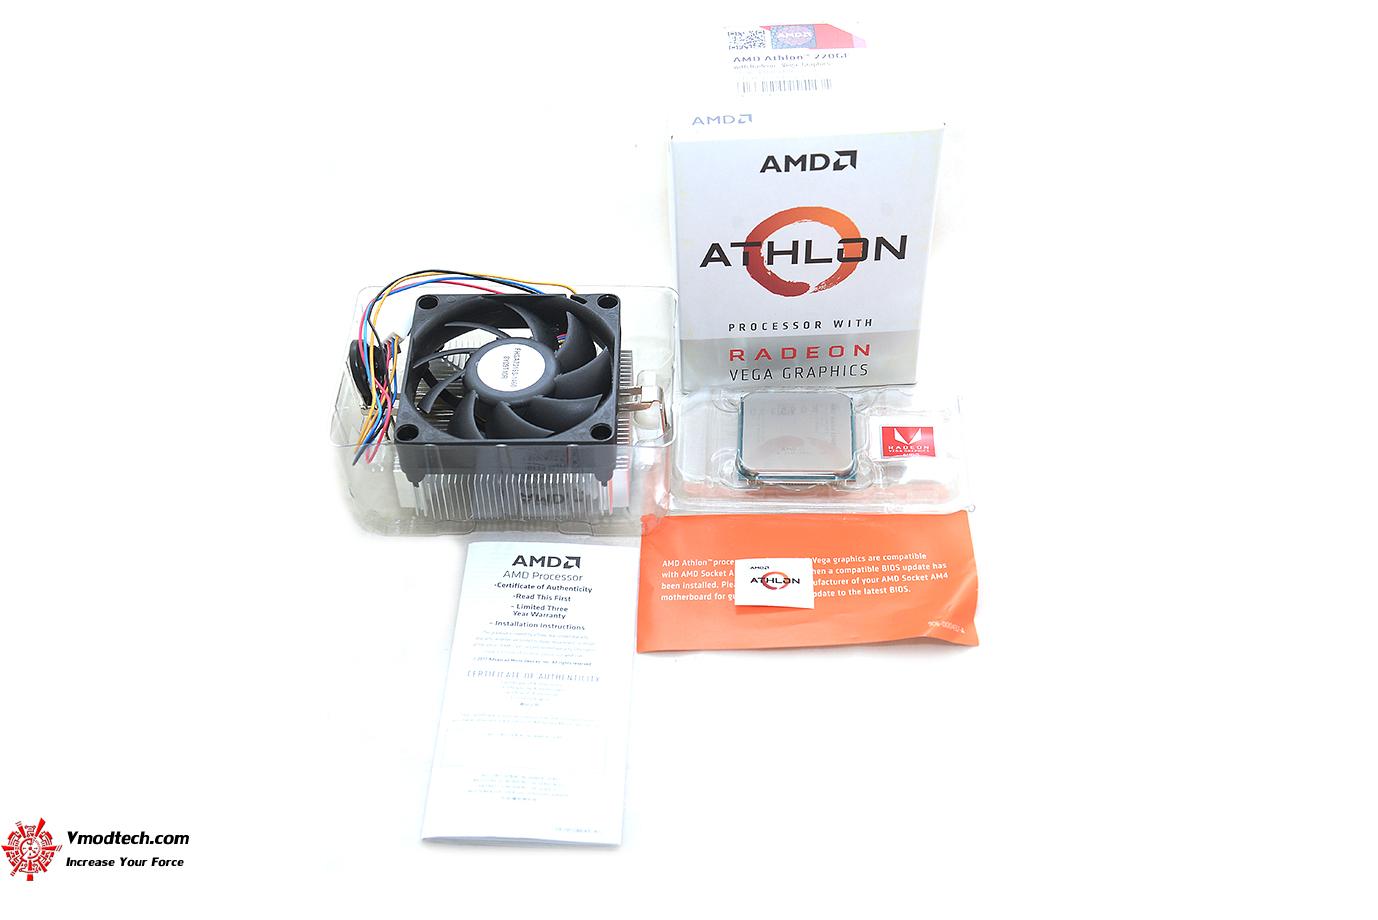 dsc 9665 AMD Athlon 220GE Processor with Radeon Vega 3 Graphics Review